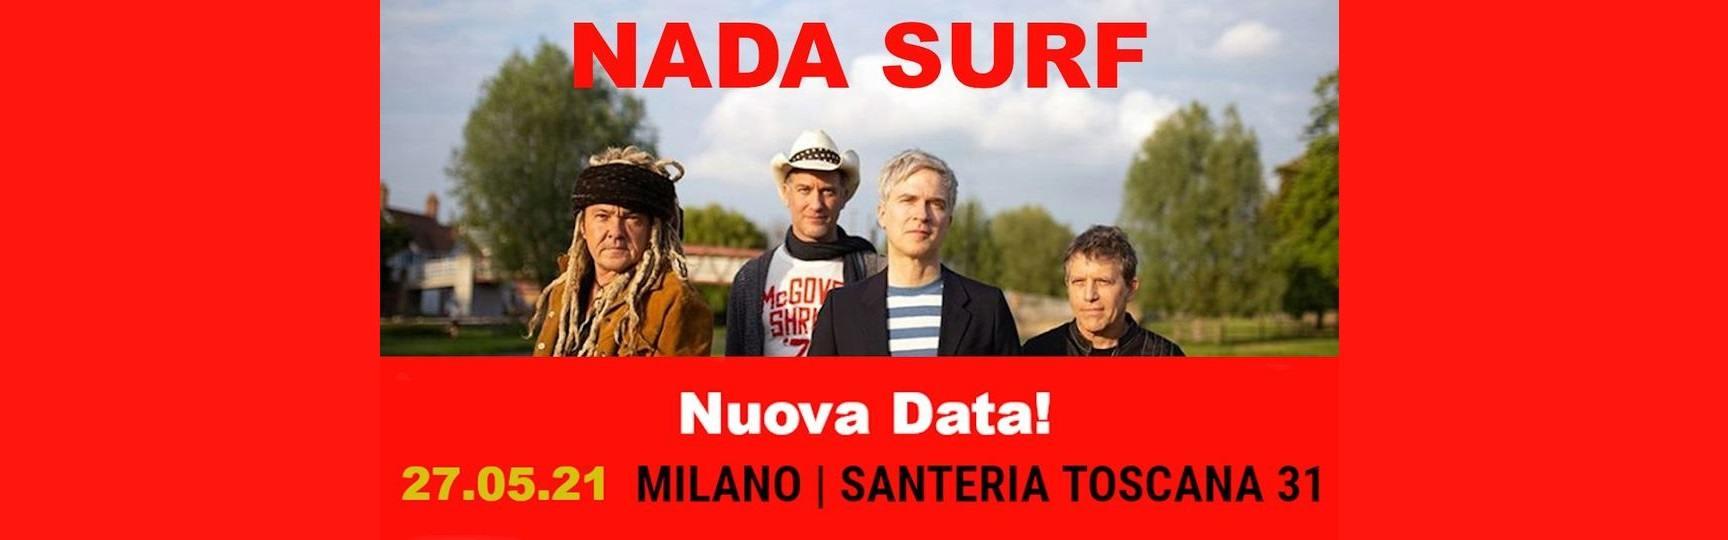 Nada Surf concert at Santeria Toscana 31 Milano 27/05/2021 biglietti tickets Mailticket | Notizie